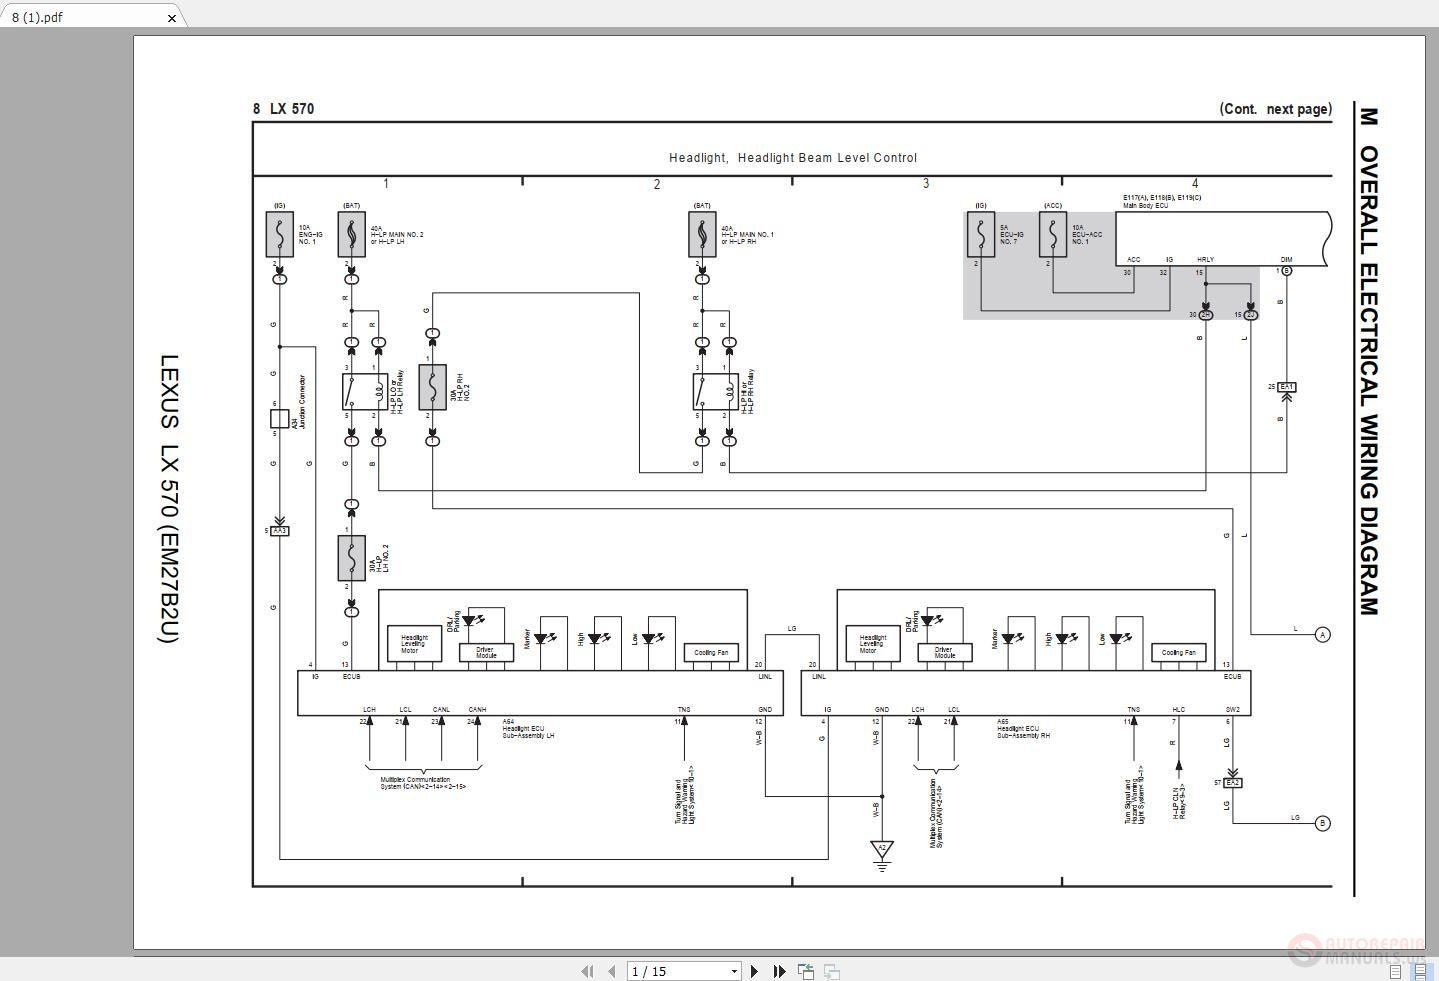 [DIAGRAM_09CH]  LEXUS LX570 2016-2018 Electrical Wiring Diagram - Auto Repair Software-Auto  EPC Software-Auto Repair Manual-Workshop Manual-Service Manual-Workshop  Manual | Lexus Electrical Wiring Diagram |  | Auto Repair Software-Auto EPC Software-Auto Repair Manual